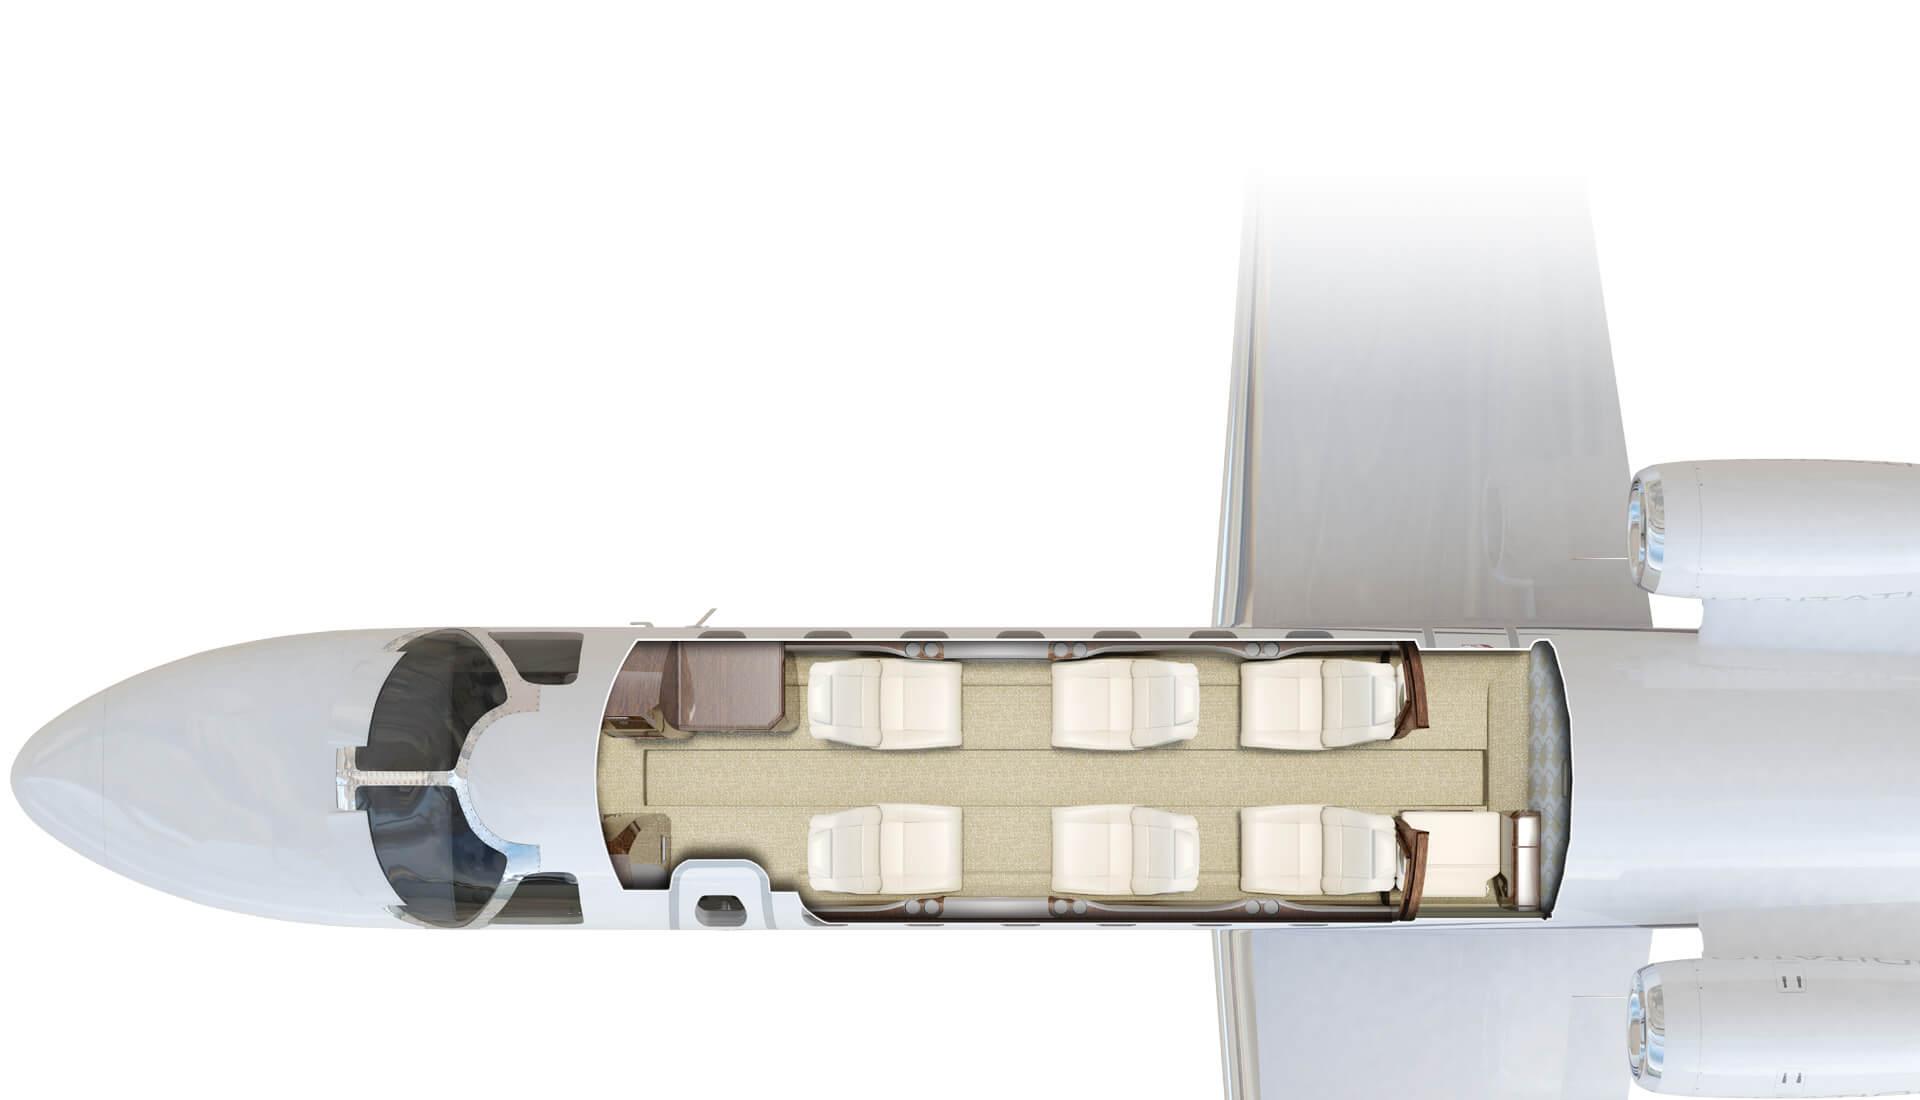 cj3plus-floorplan-standard.jpg